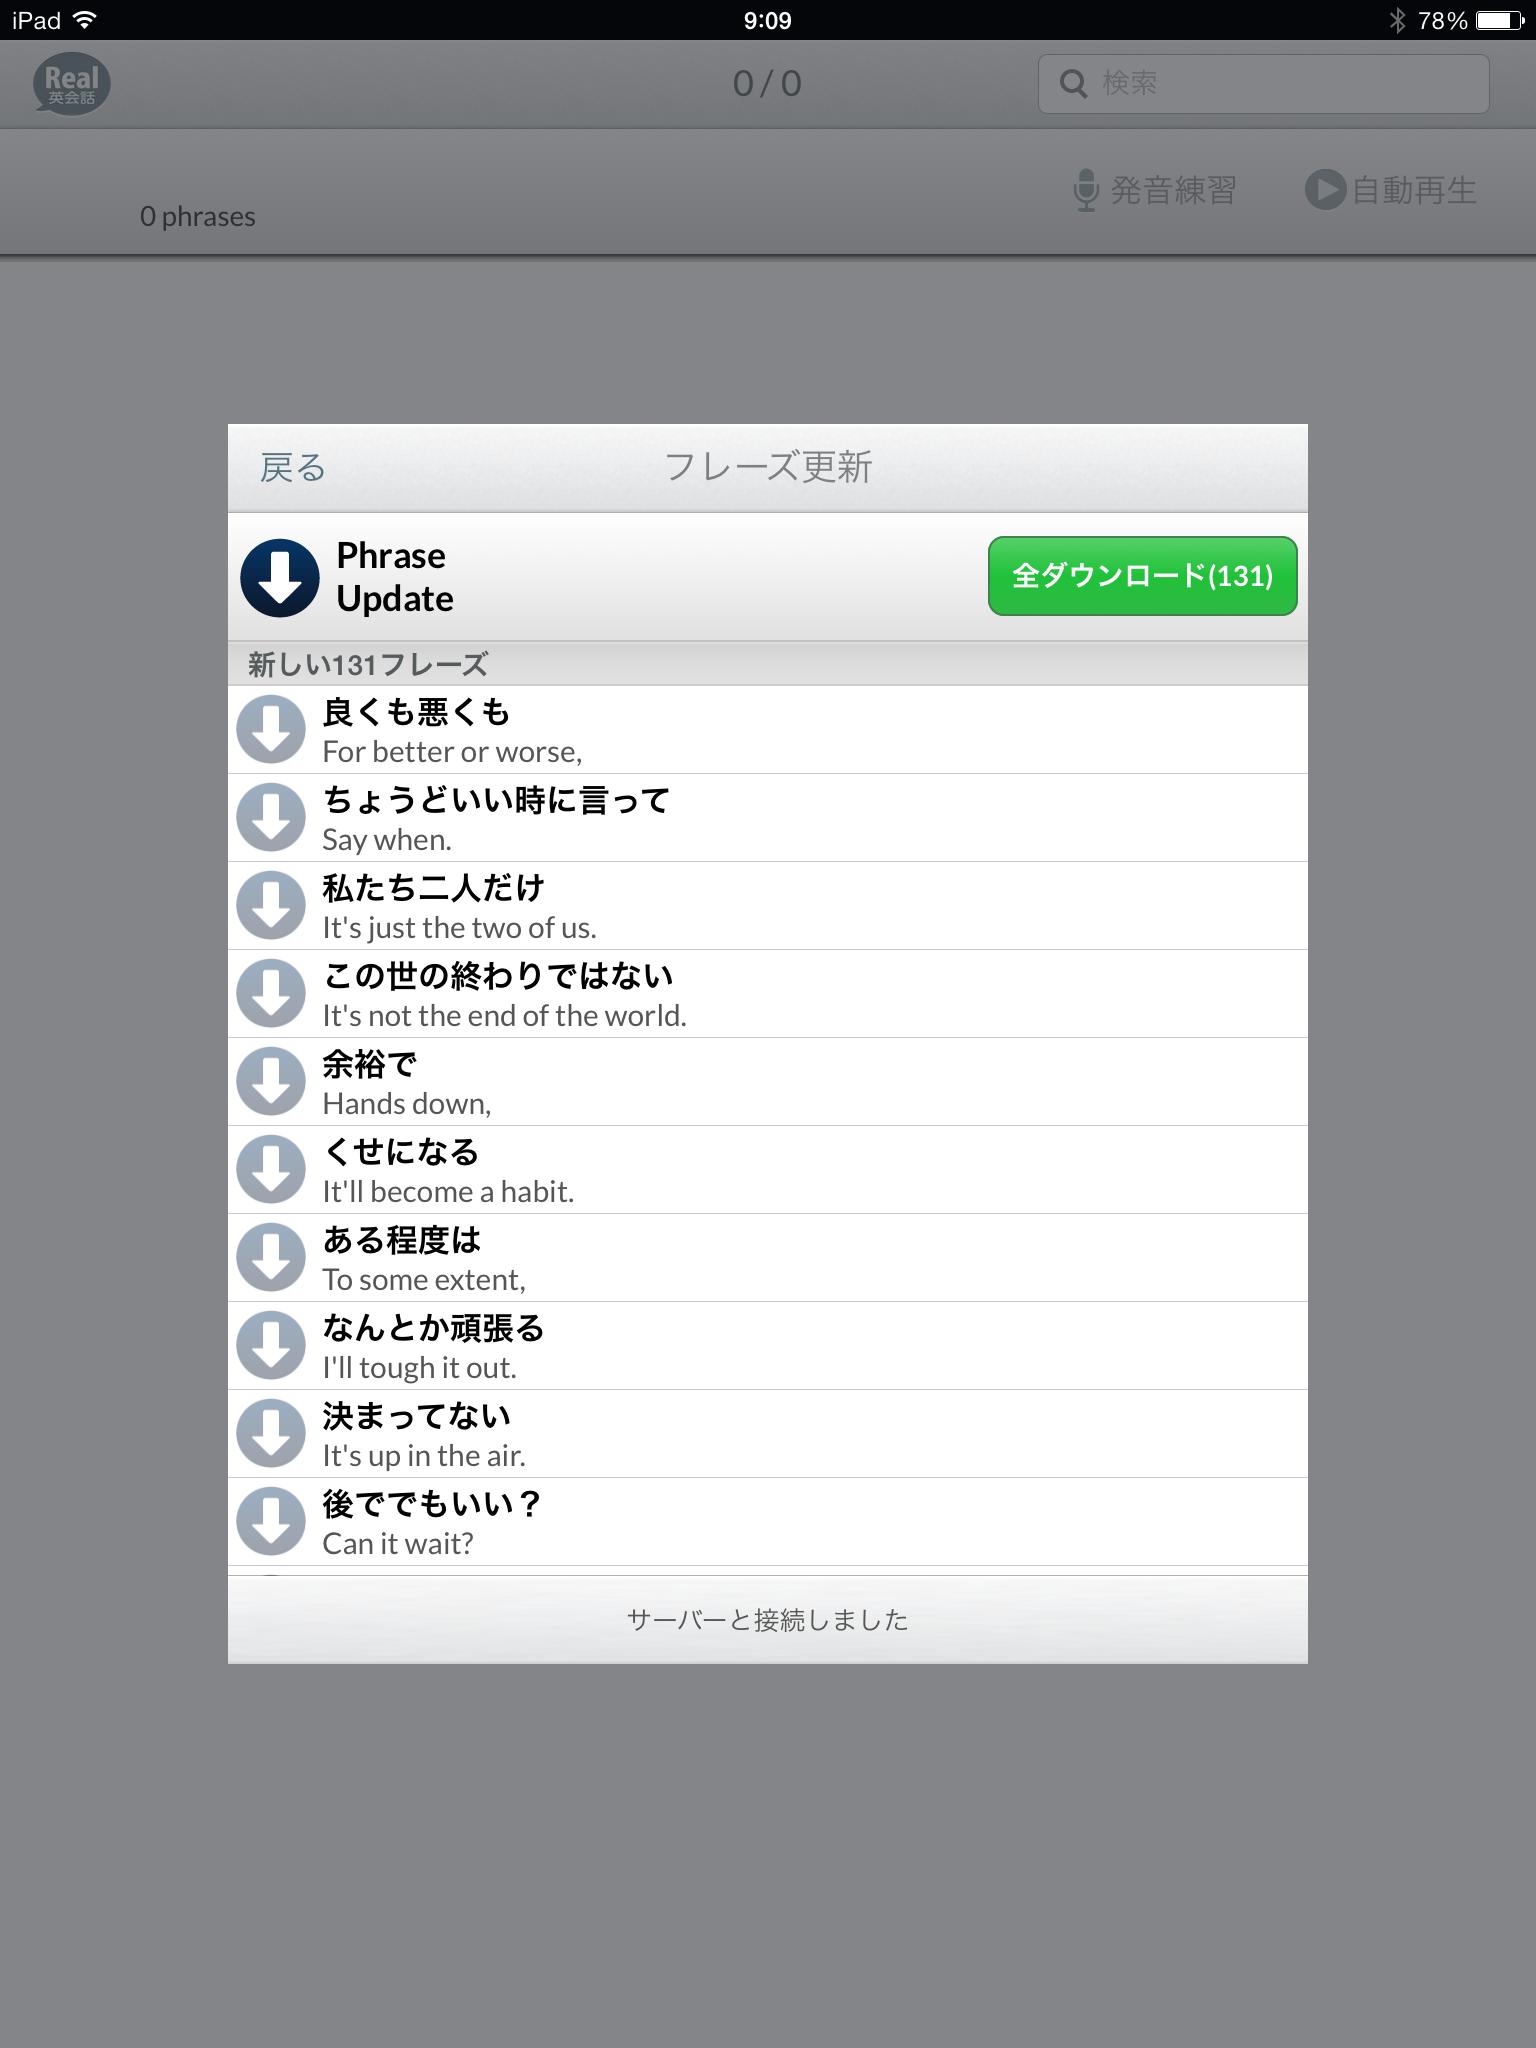 Real英会話:楽しみながら、本格英語を学べる学習アプリ!!!!